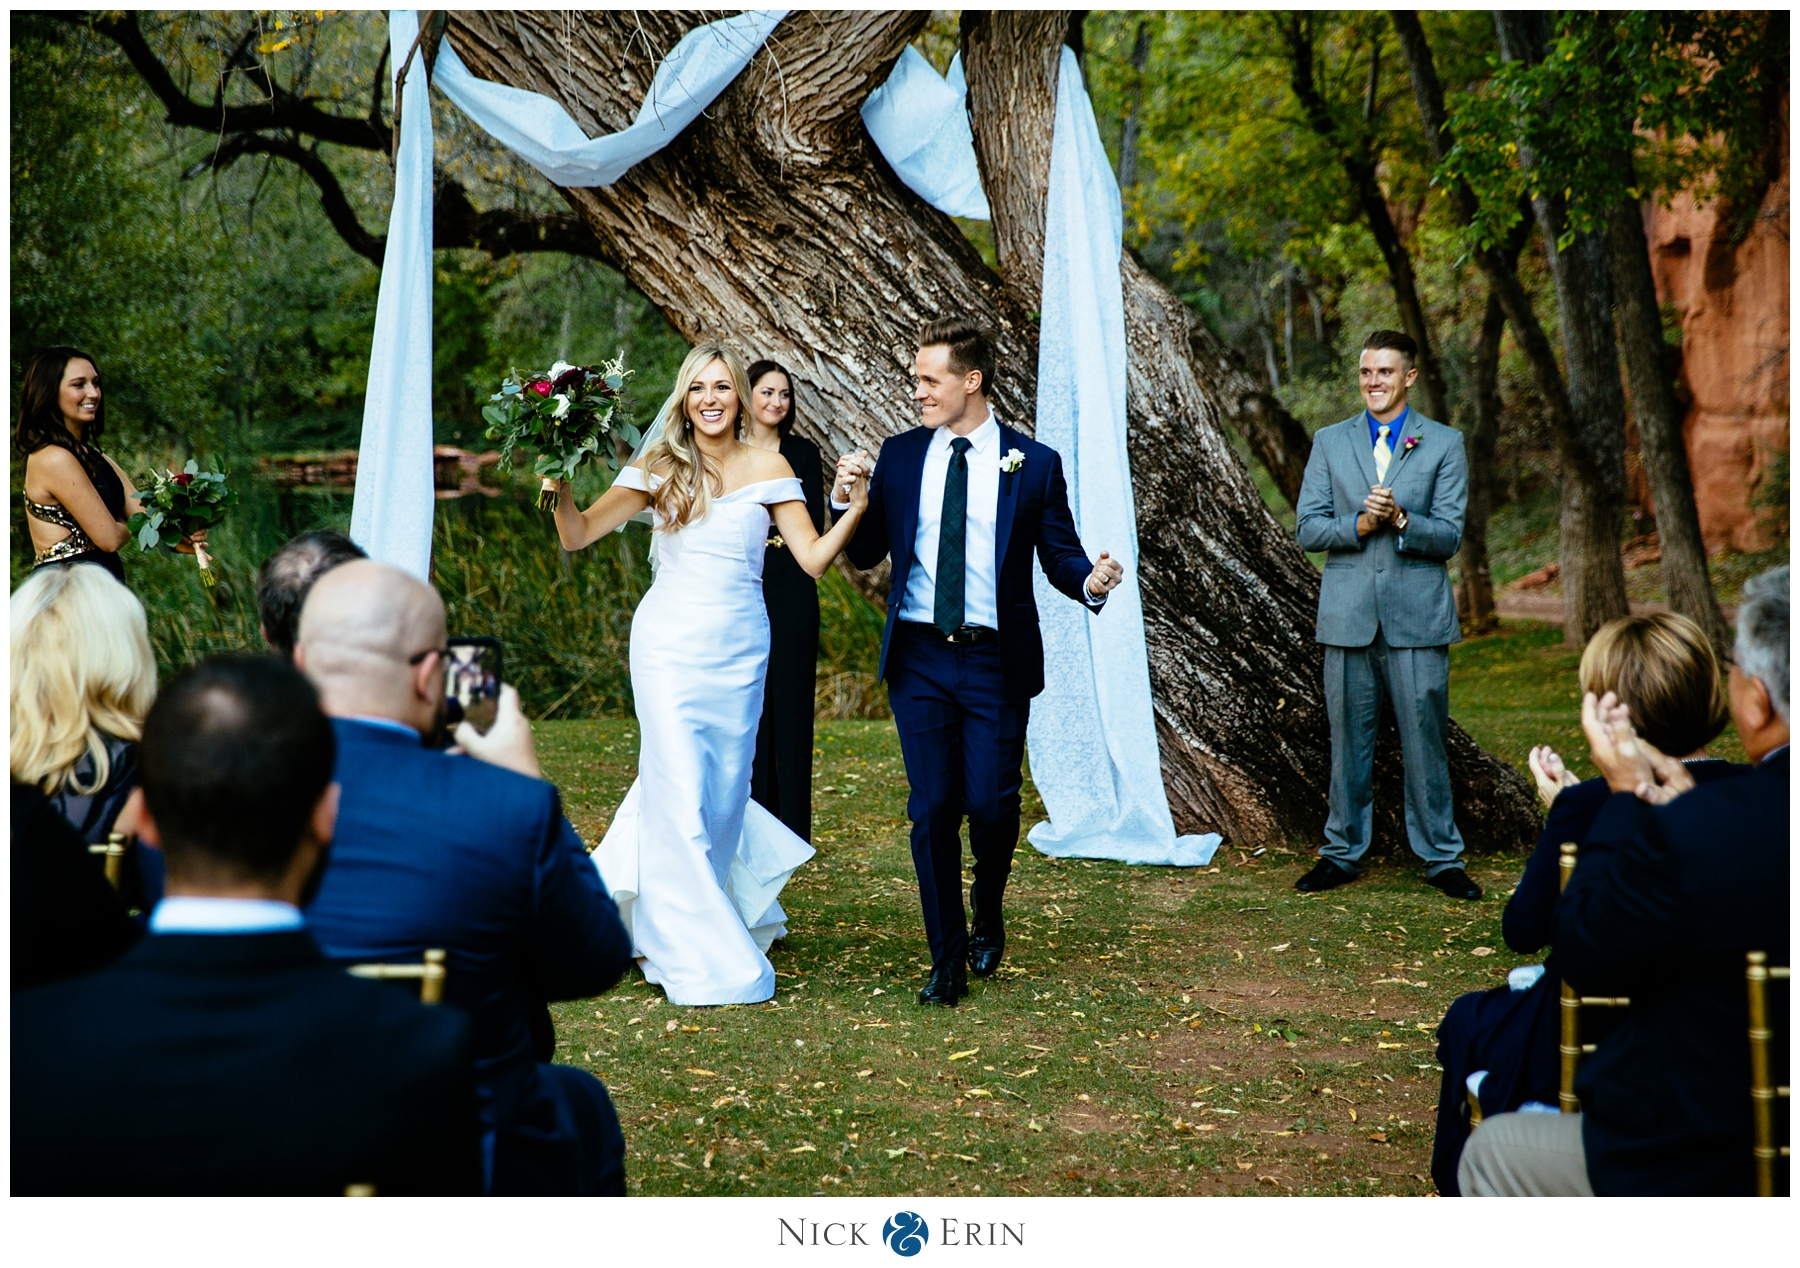 Donner_Photography_Sedona Arizona Wedding_Alissa and Tom_0047